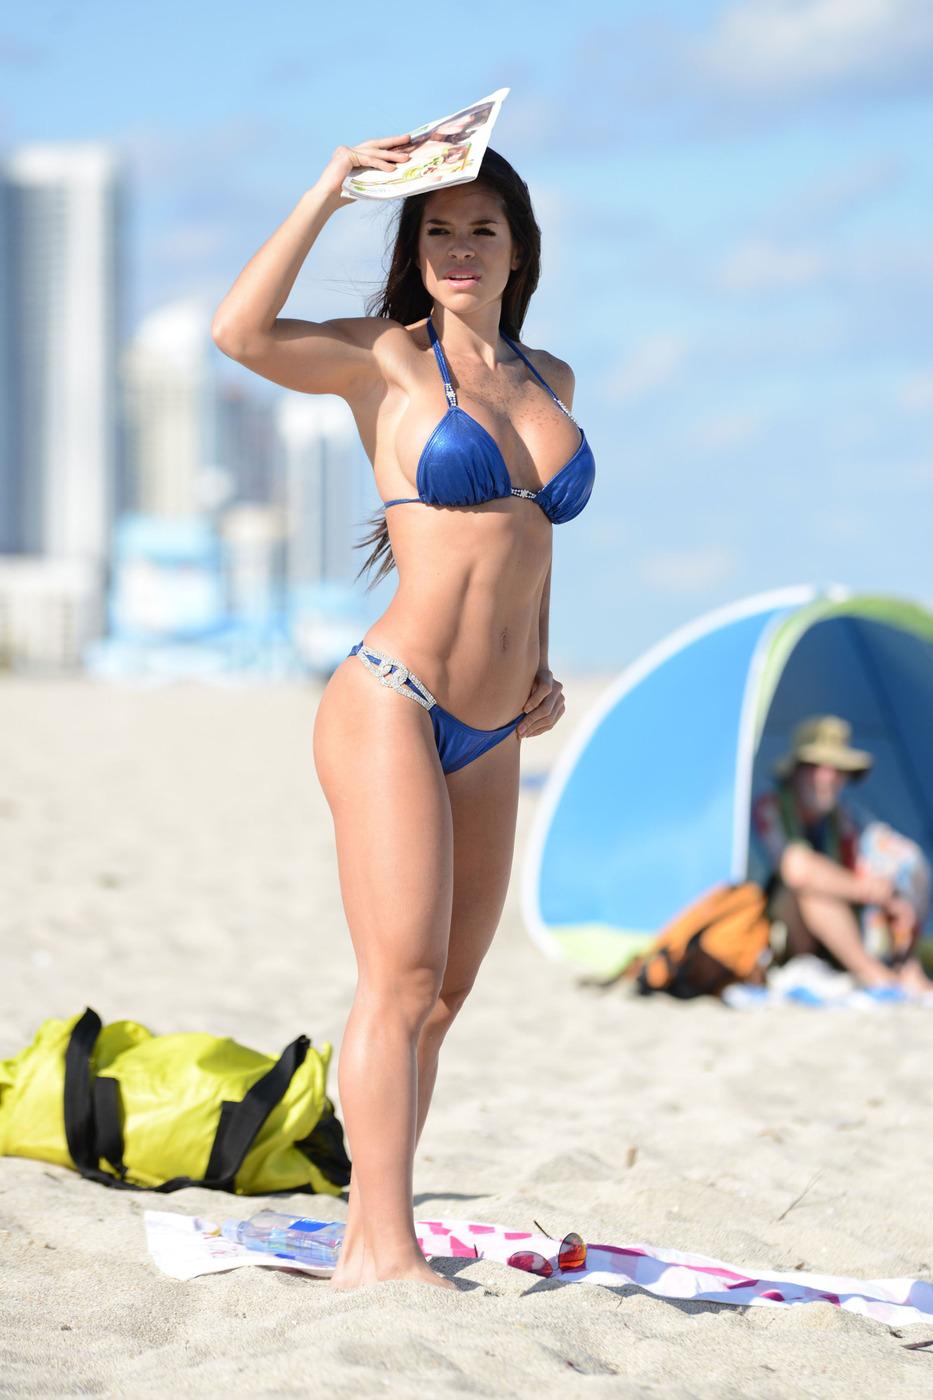 Barely there jeanious bikini